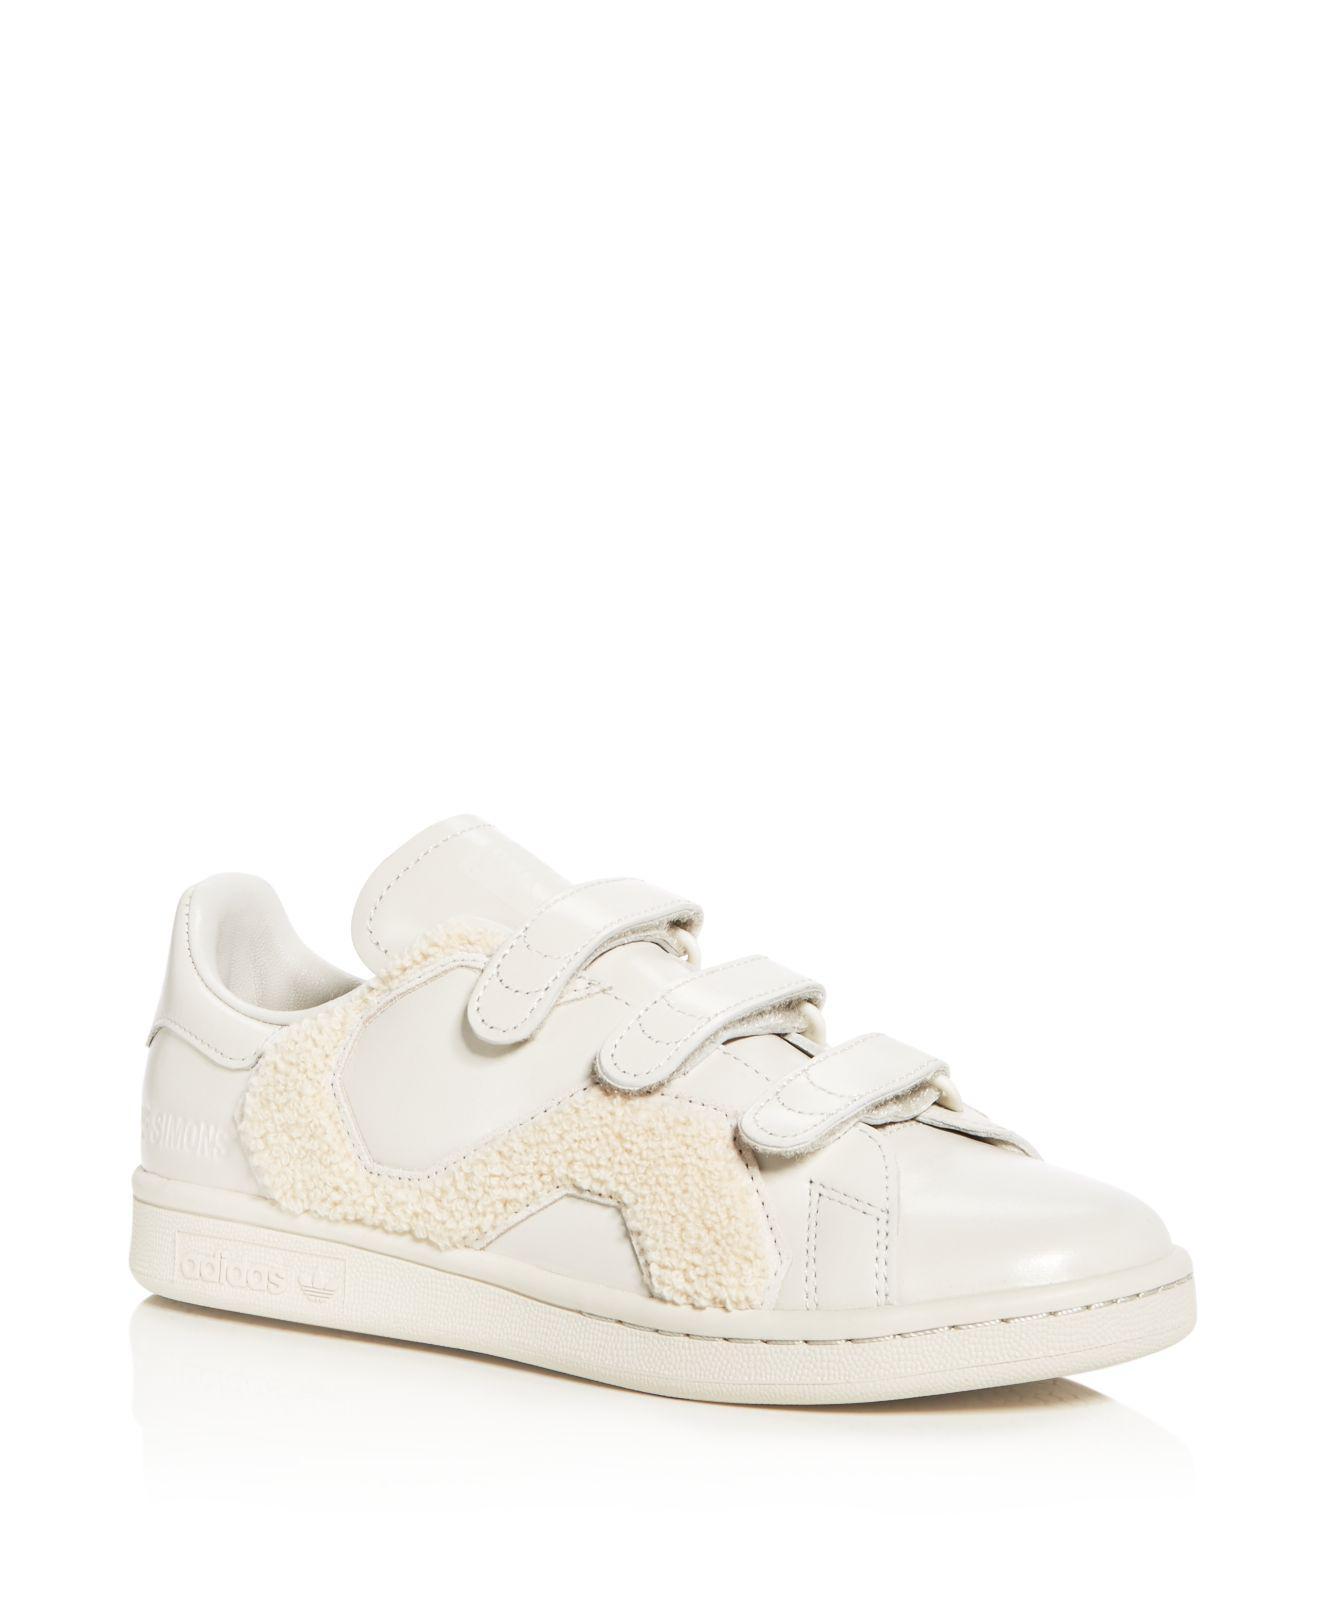 4fb414dca Raf Simons Adidas Lyst Shoes Sale Women Sneakers Boys Adidas Magenta ...